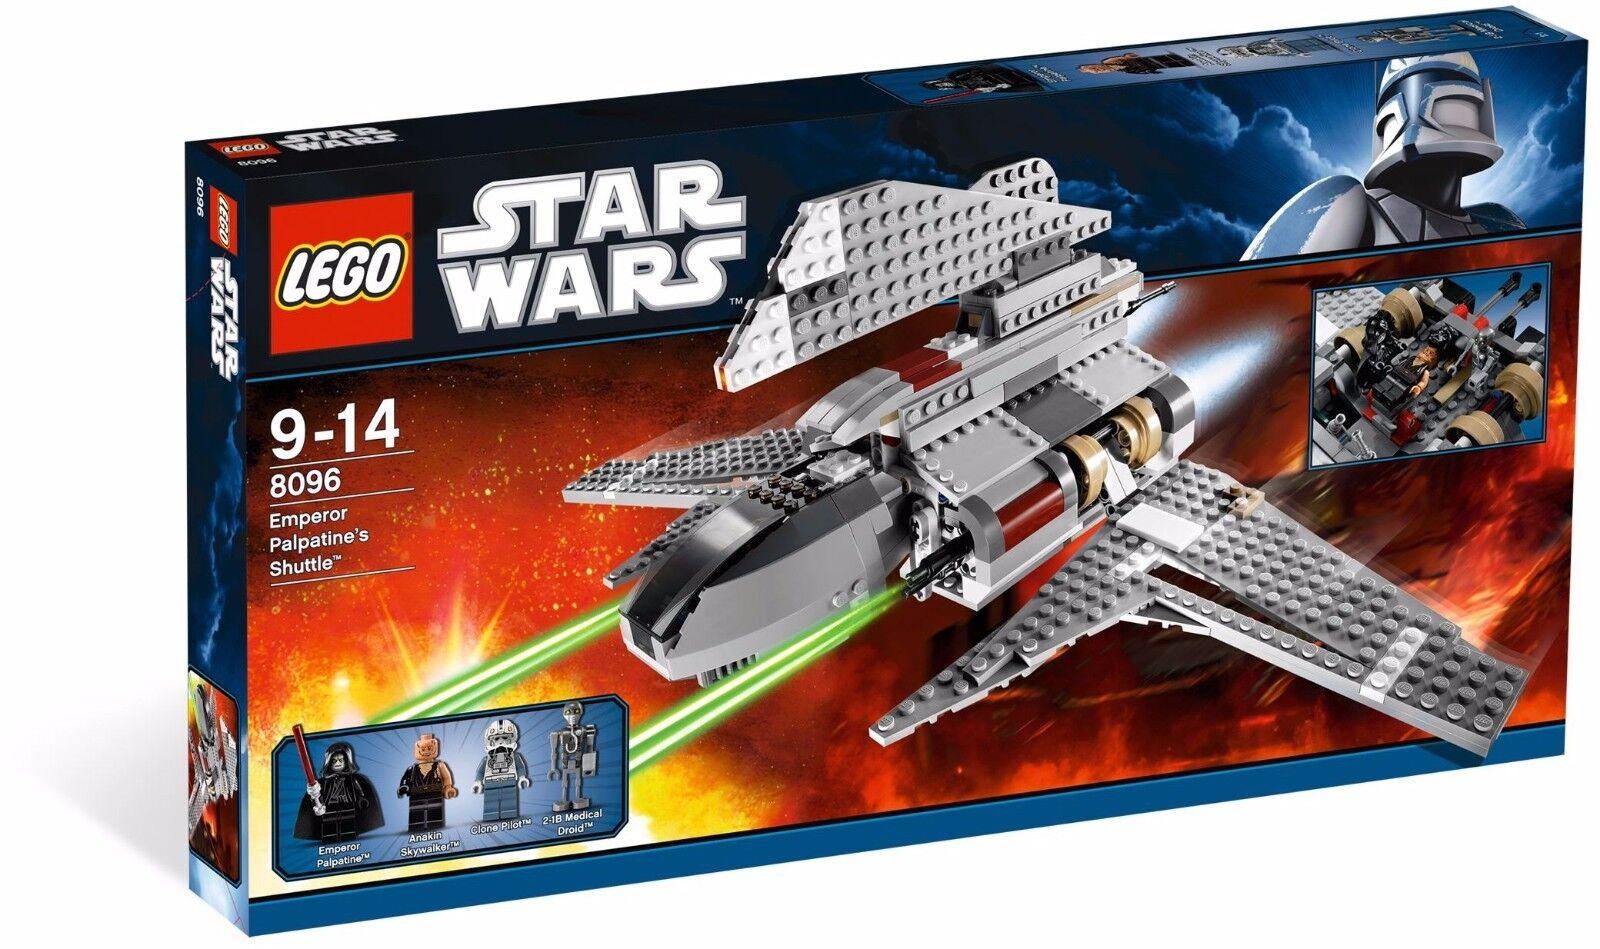 LEGO Star Wars 8096 Palpatine's Shuttle Brand New in Sealed Box